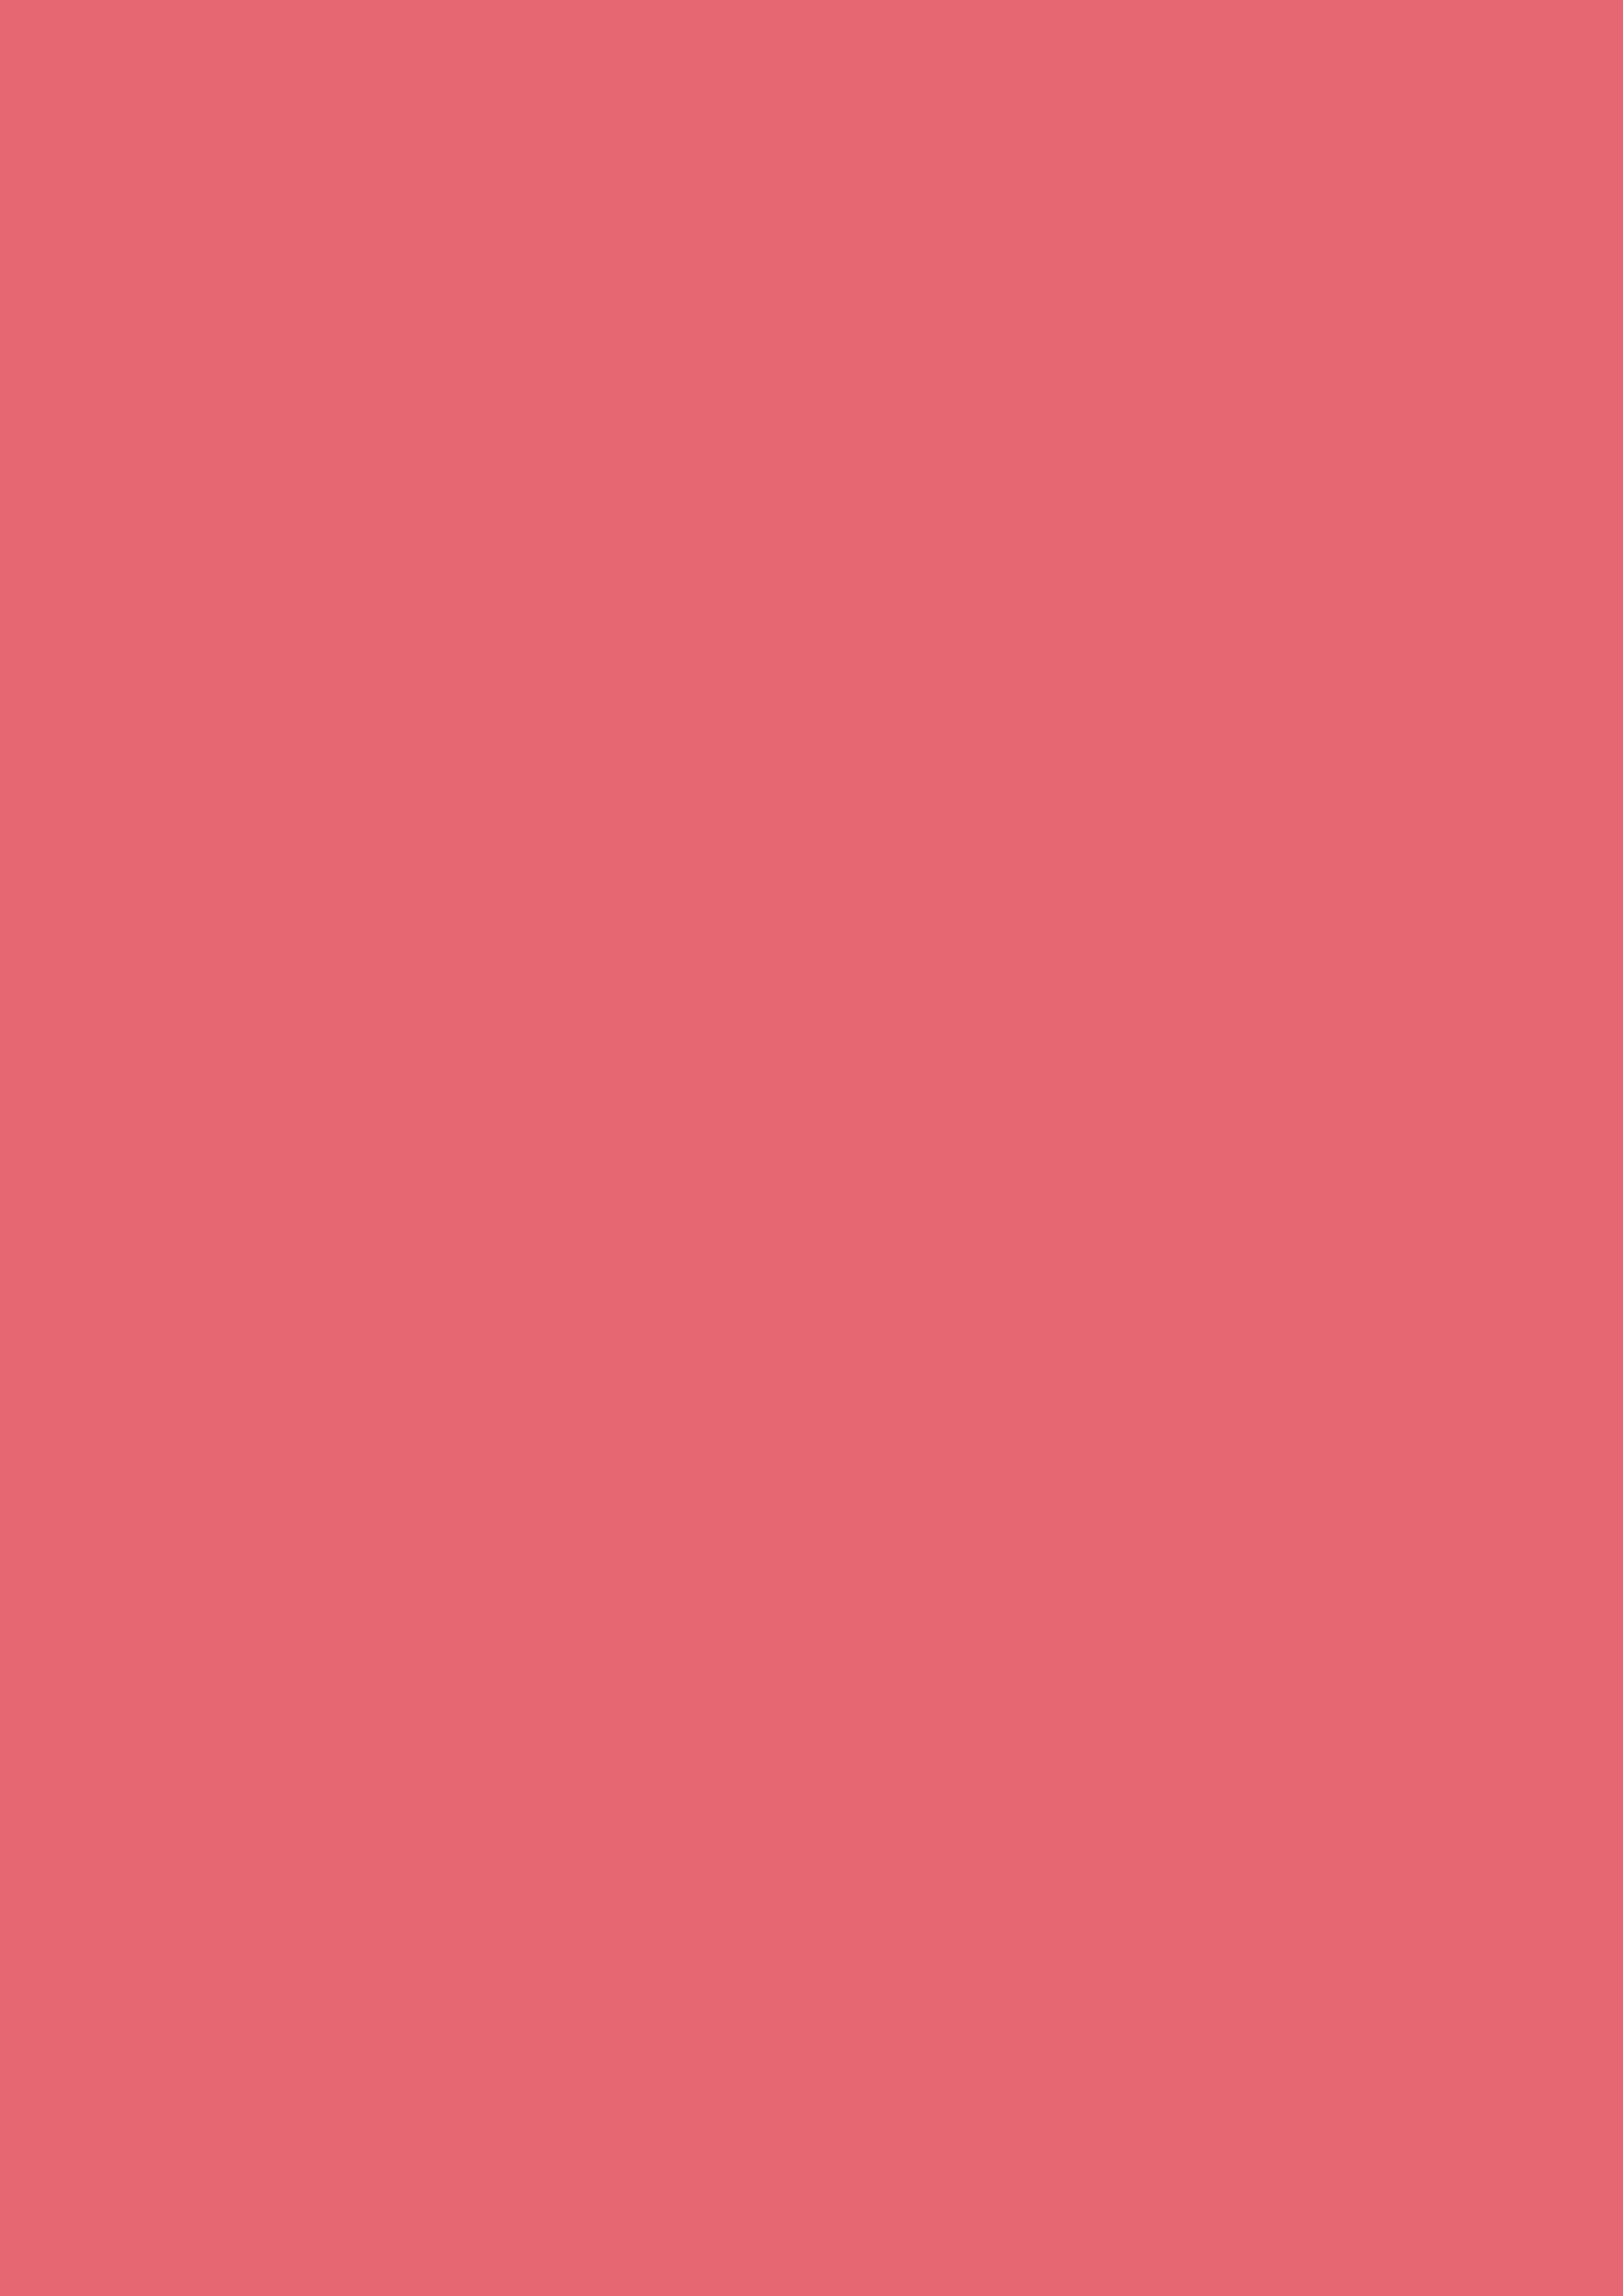 2480x3508 Light Carmine Pink Solid Color Background